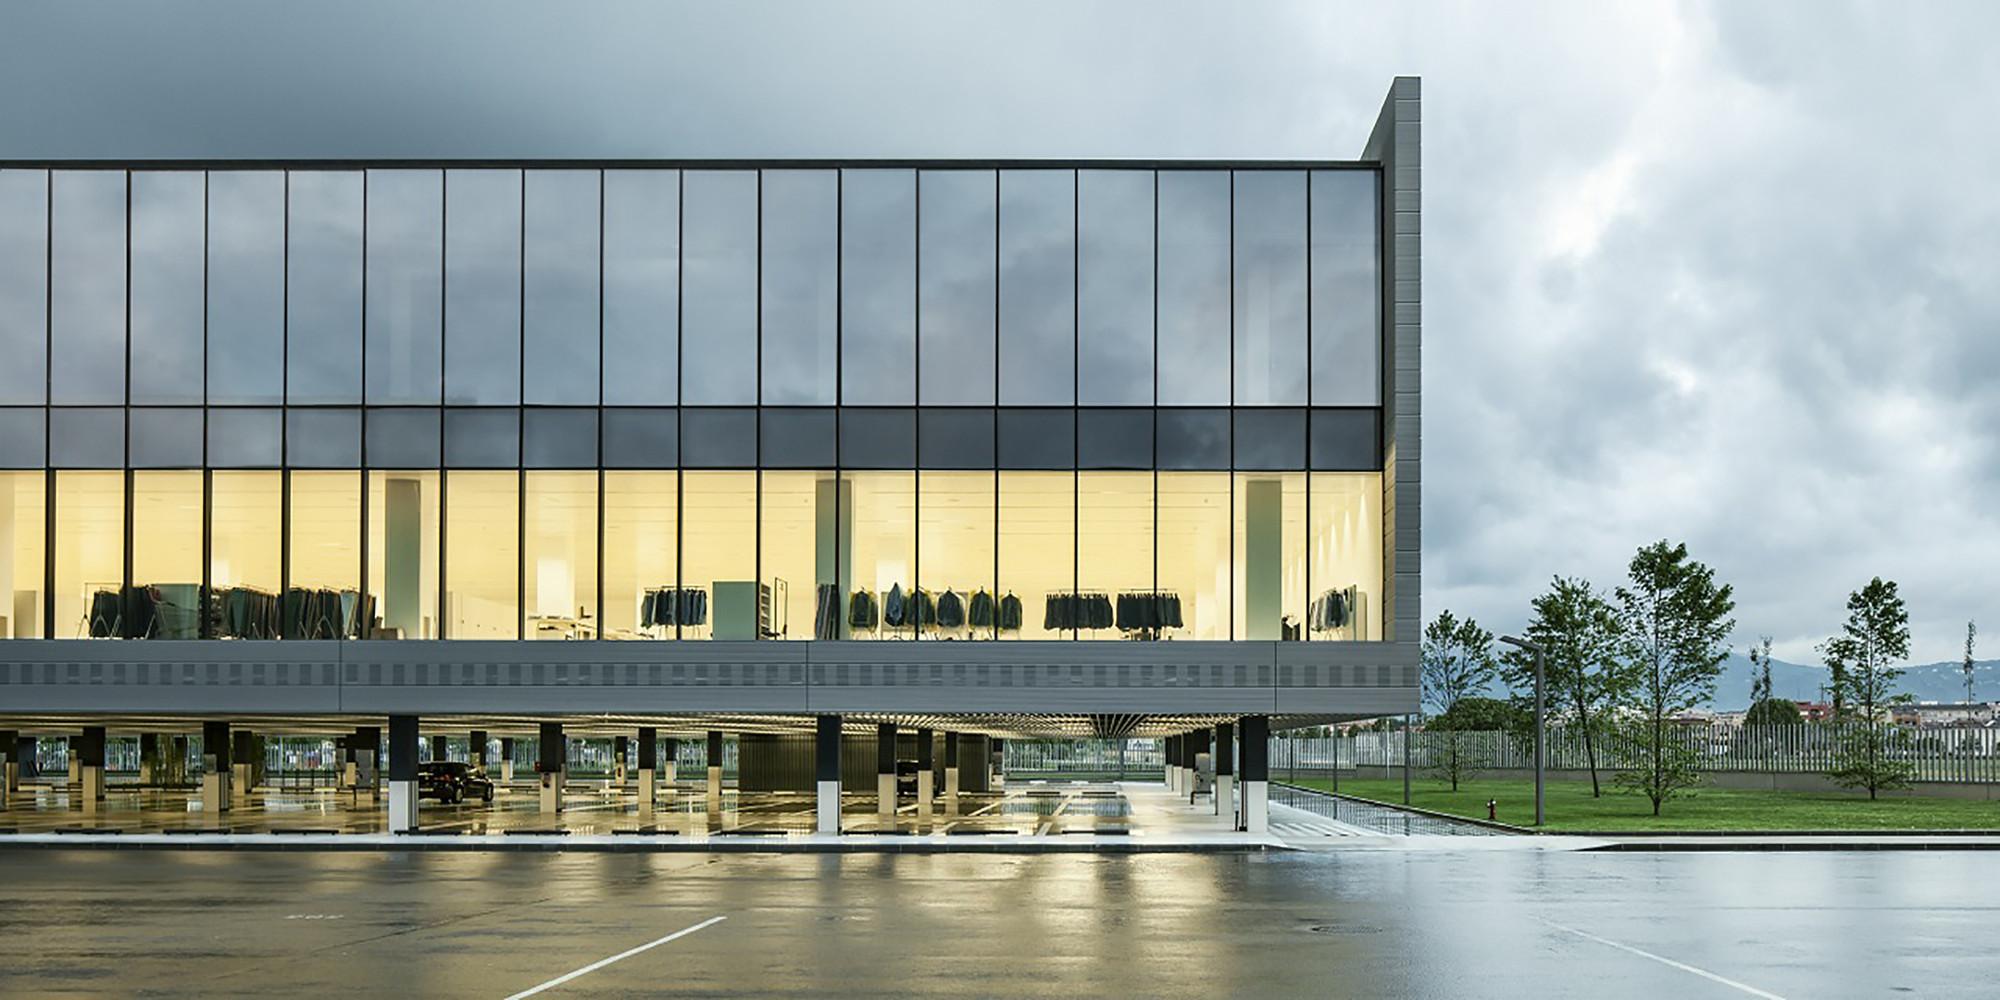 New Massimo Dutti Headquarters In Tordera  / Battle i Roig Architectes, © Jordi Surroca